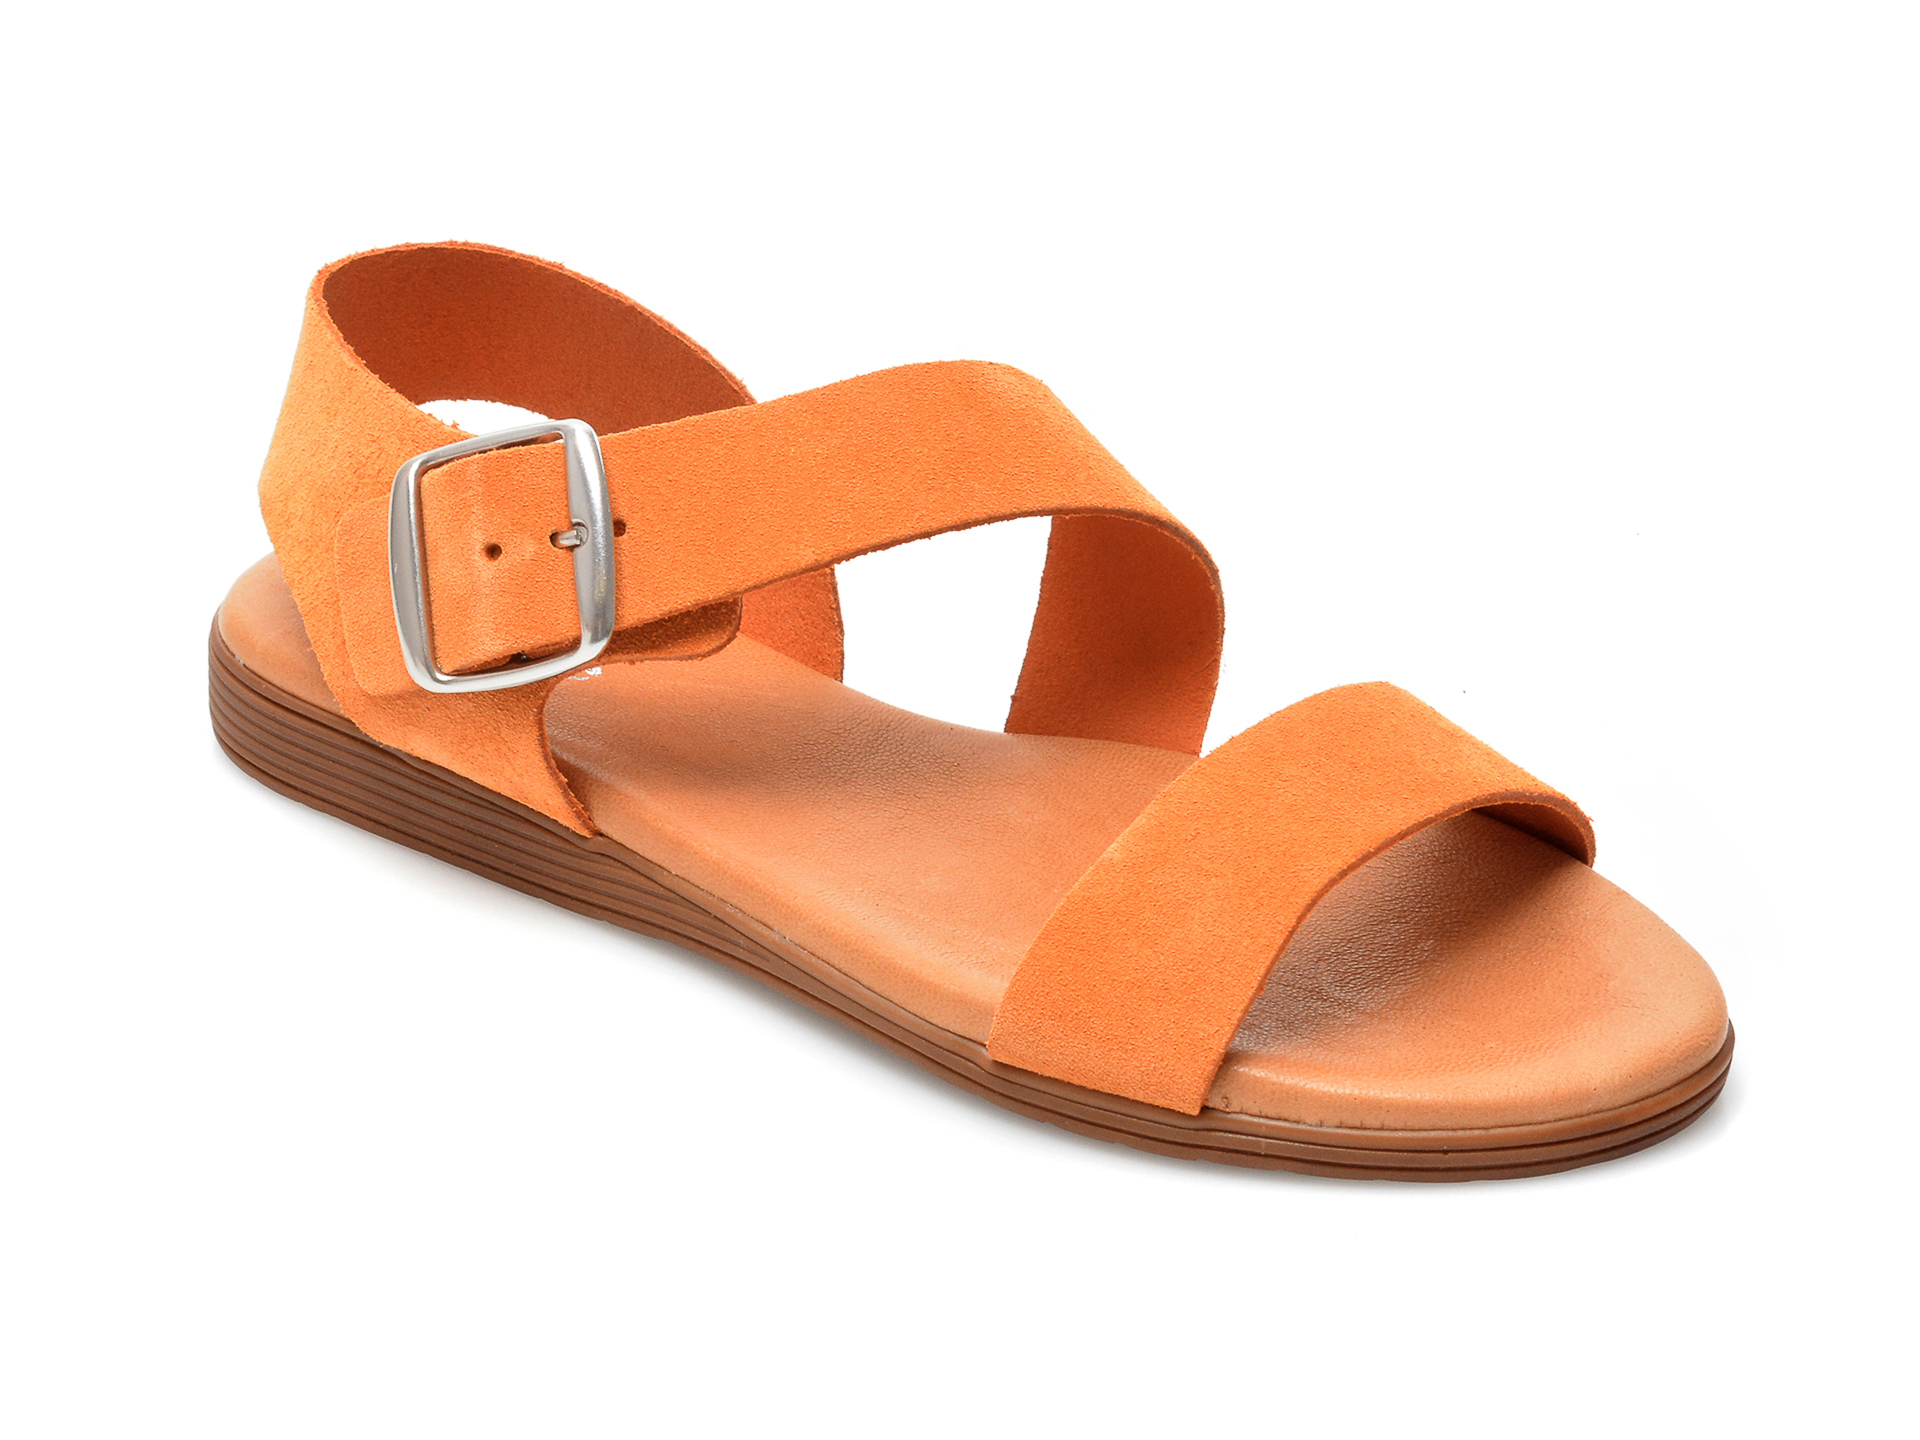 Sandale IMAGE portocalii, 1428S, din piele intoarsa imagine otter.ro